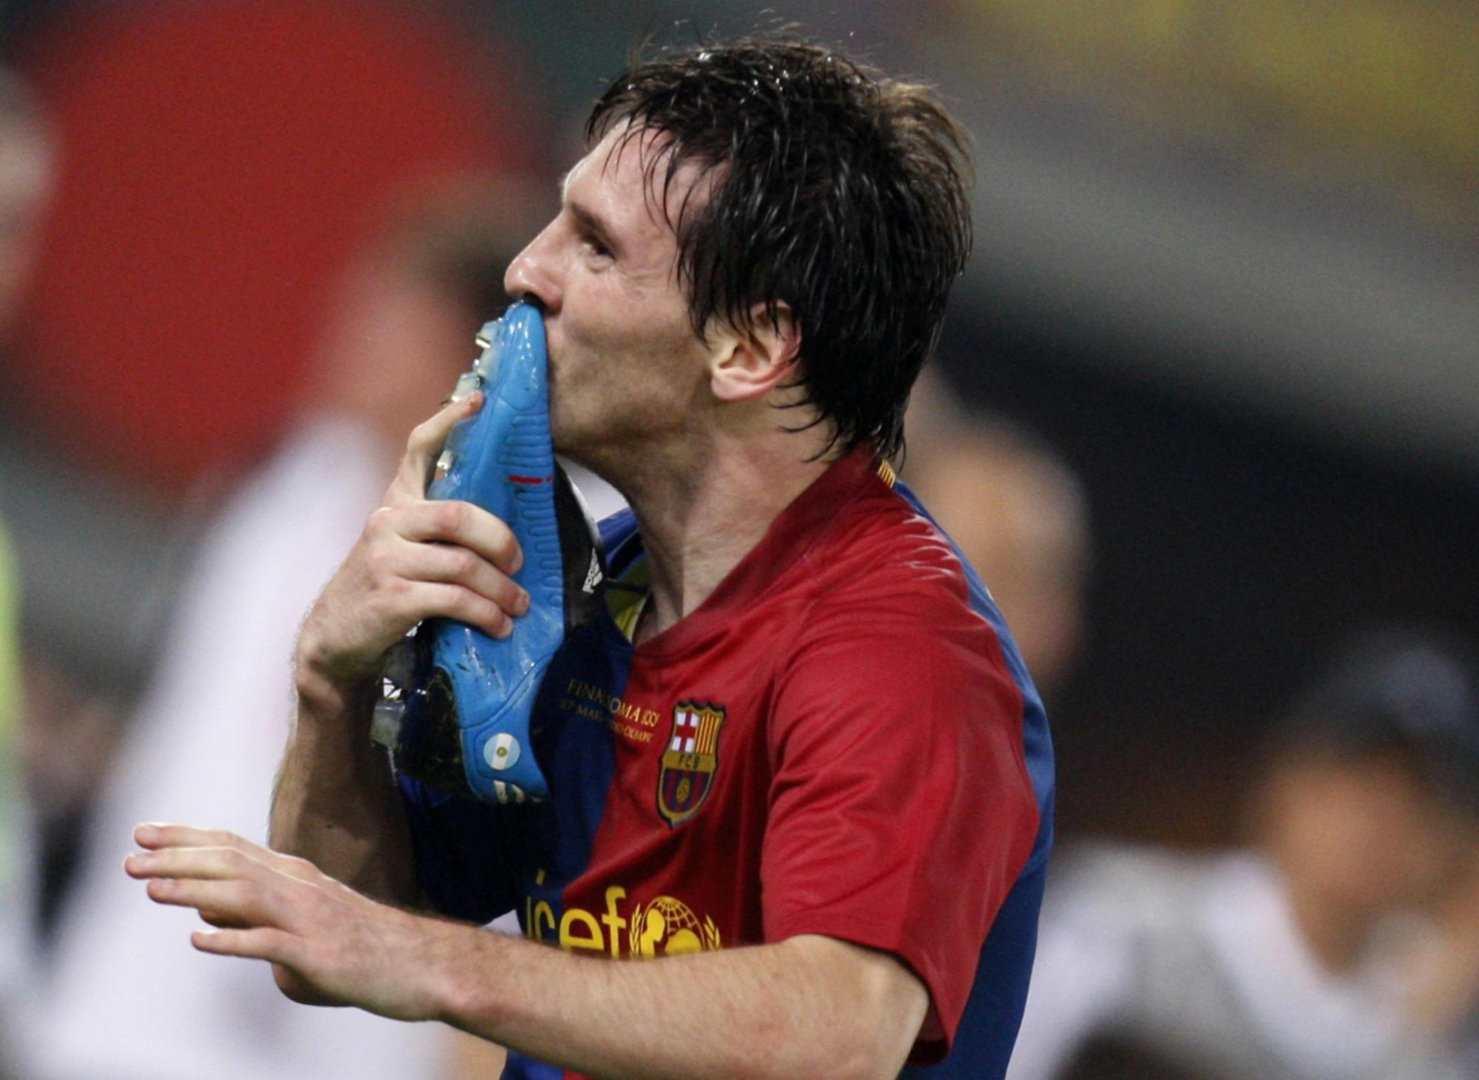 http://3.bp.blogspot.com/-lBaNTNEWfO0/UFgb_etOwLI/AAAAAAAAD3g/tCUURZR4-zs/s1600/Lionel-Messi-Wallpapers-16.jpg